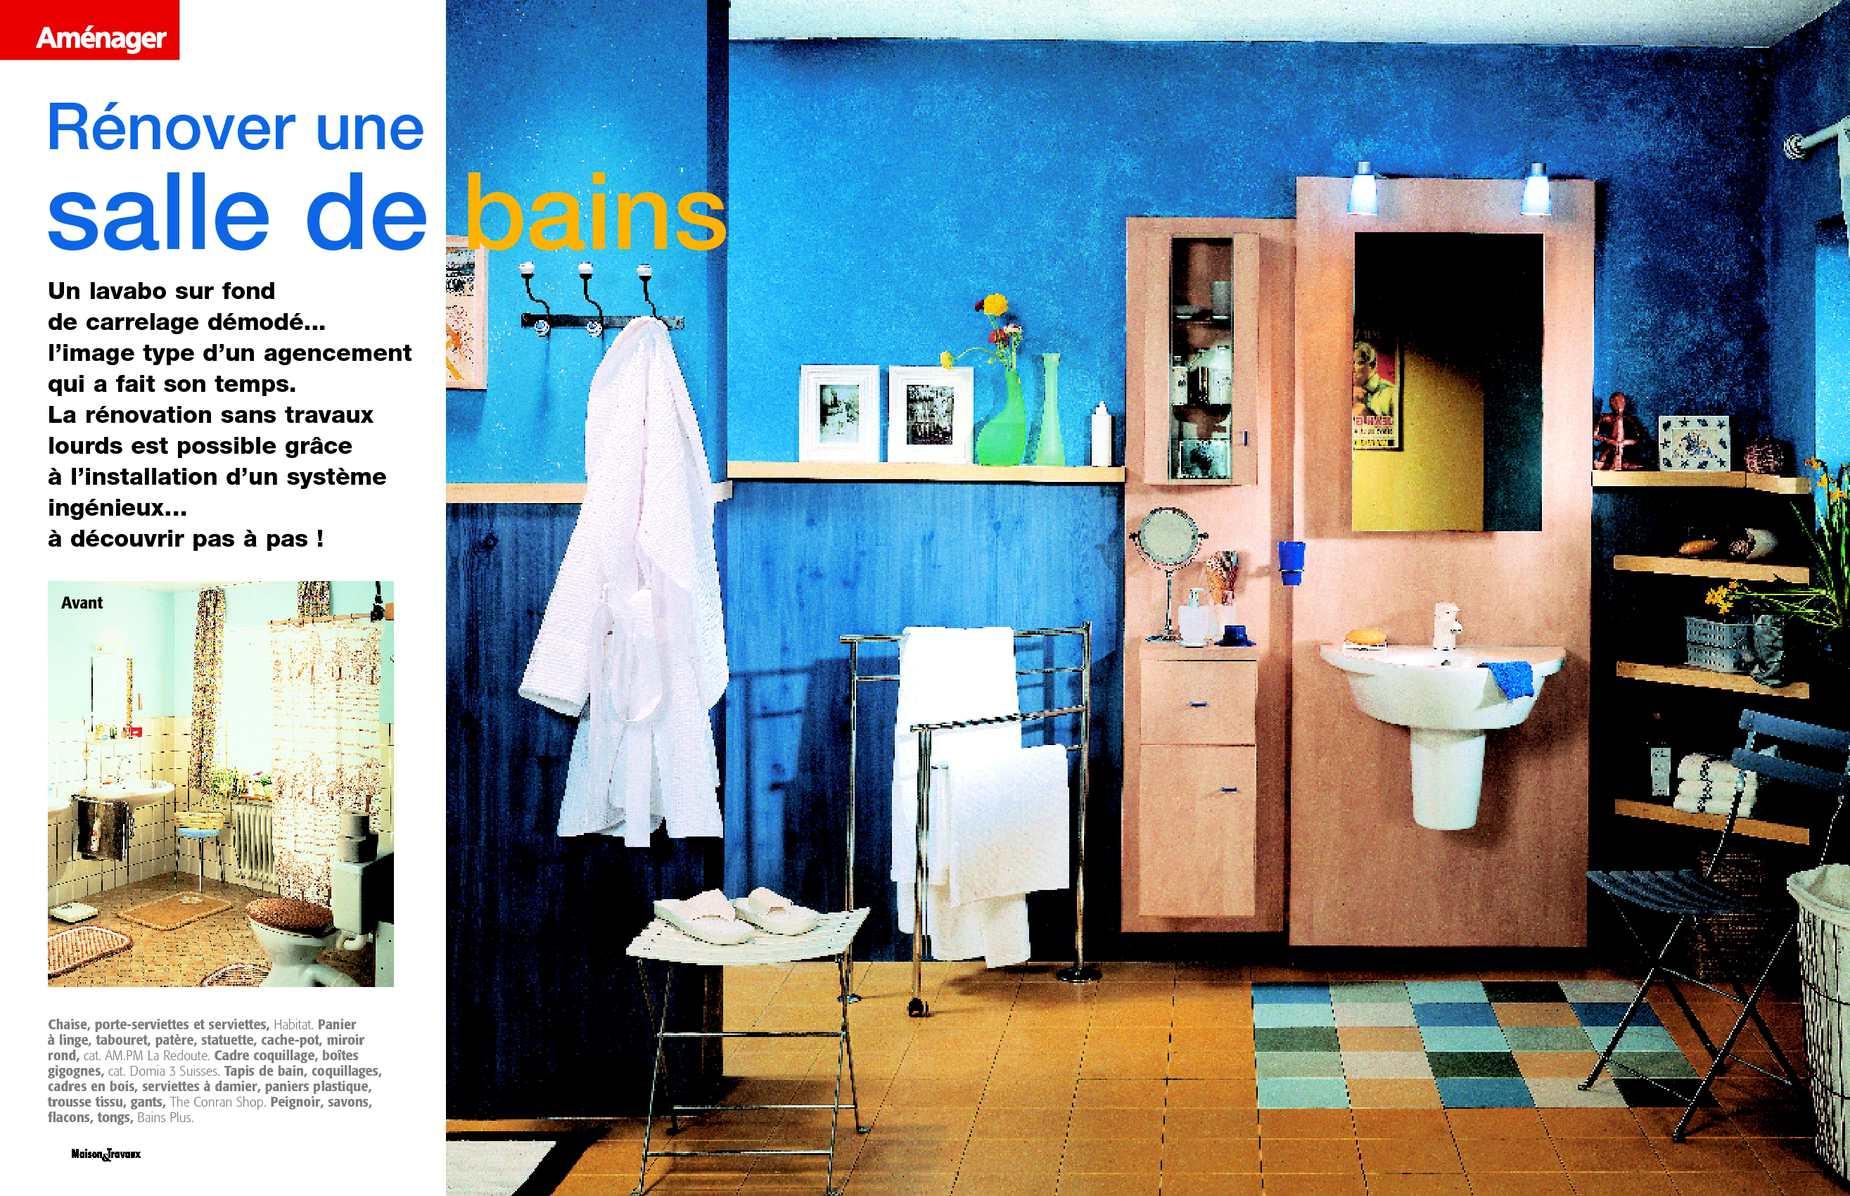 Cacher Trou Carrelage Salle De Bain calaméo - rénover une salle de bains